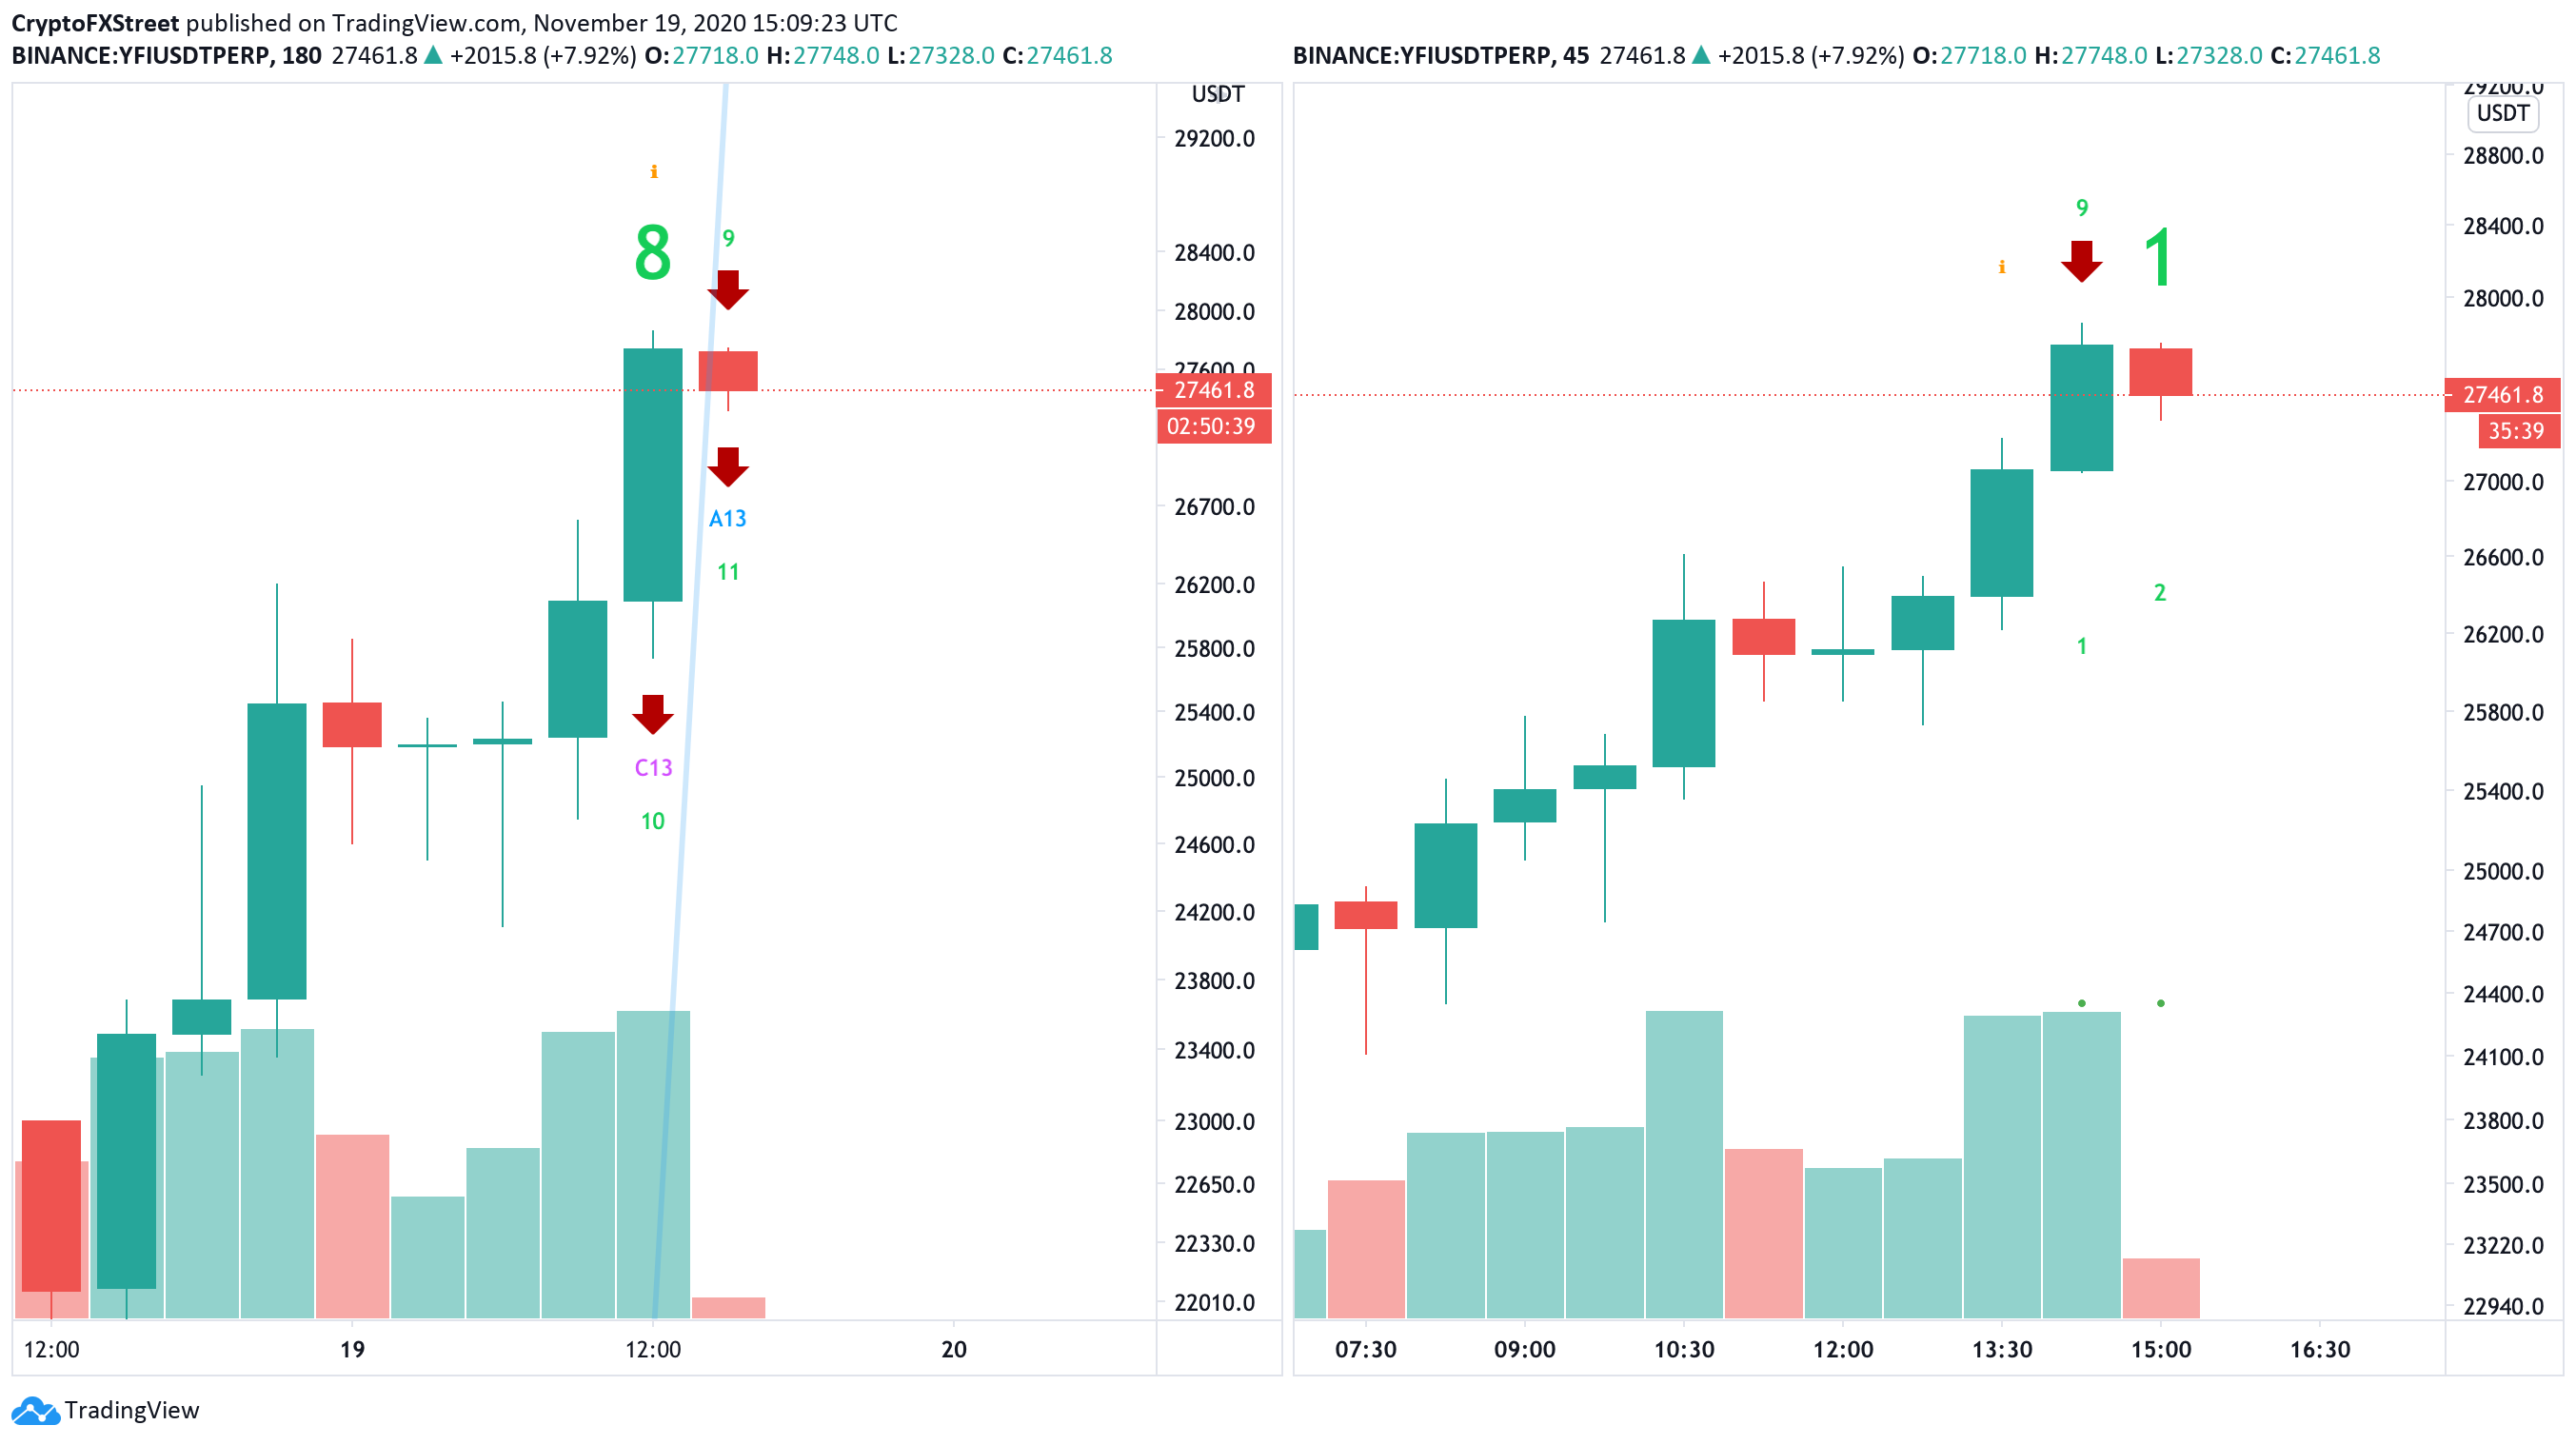 YFI/USD 3-hour and 45-min charts